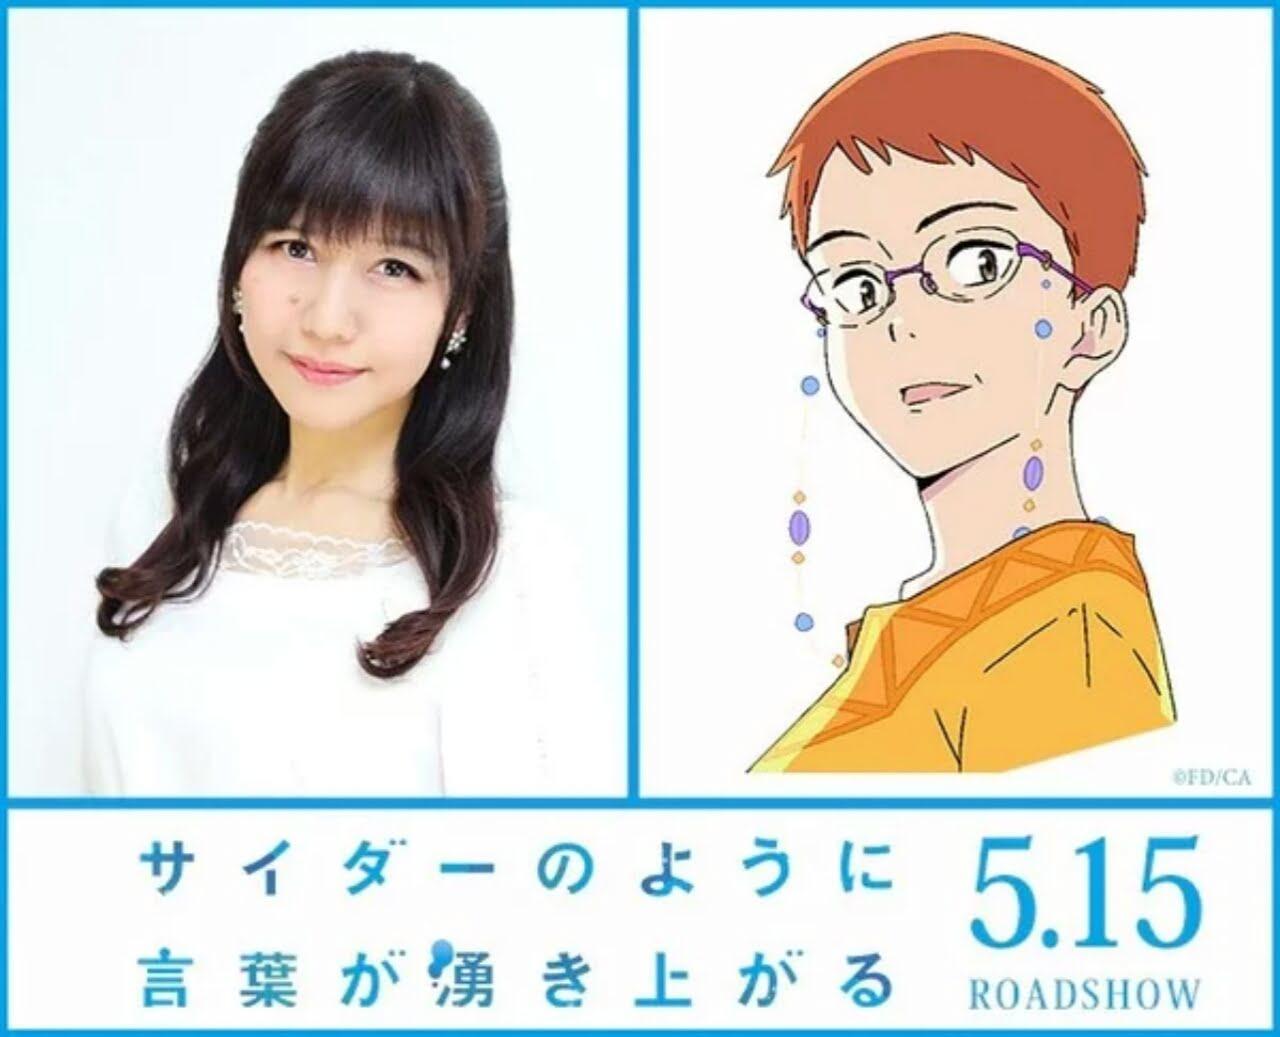 Film Anime Words Bubble Up Like Soda Pop Diperankan Kikuko Inoue 1